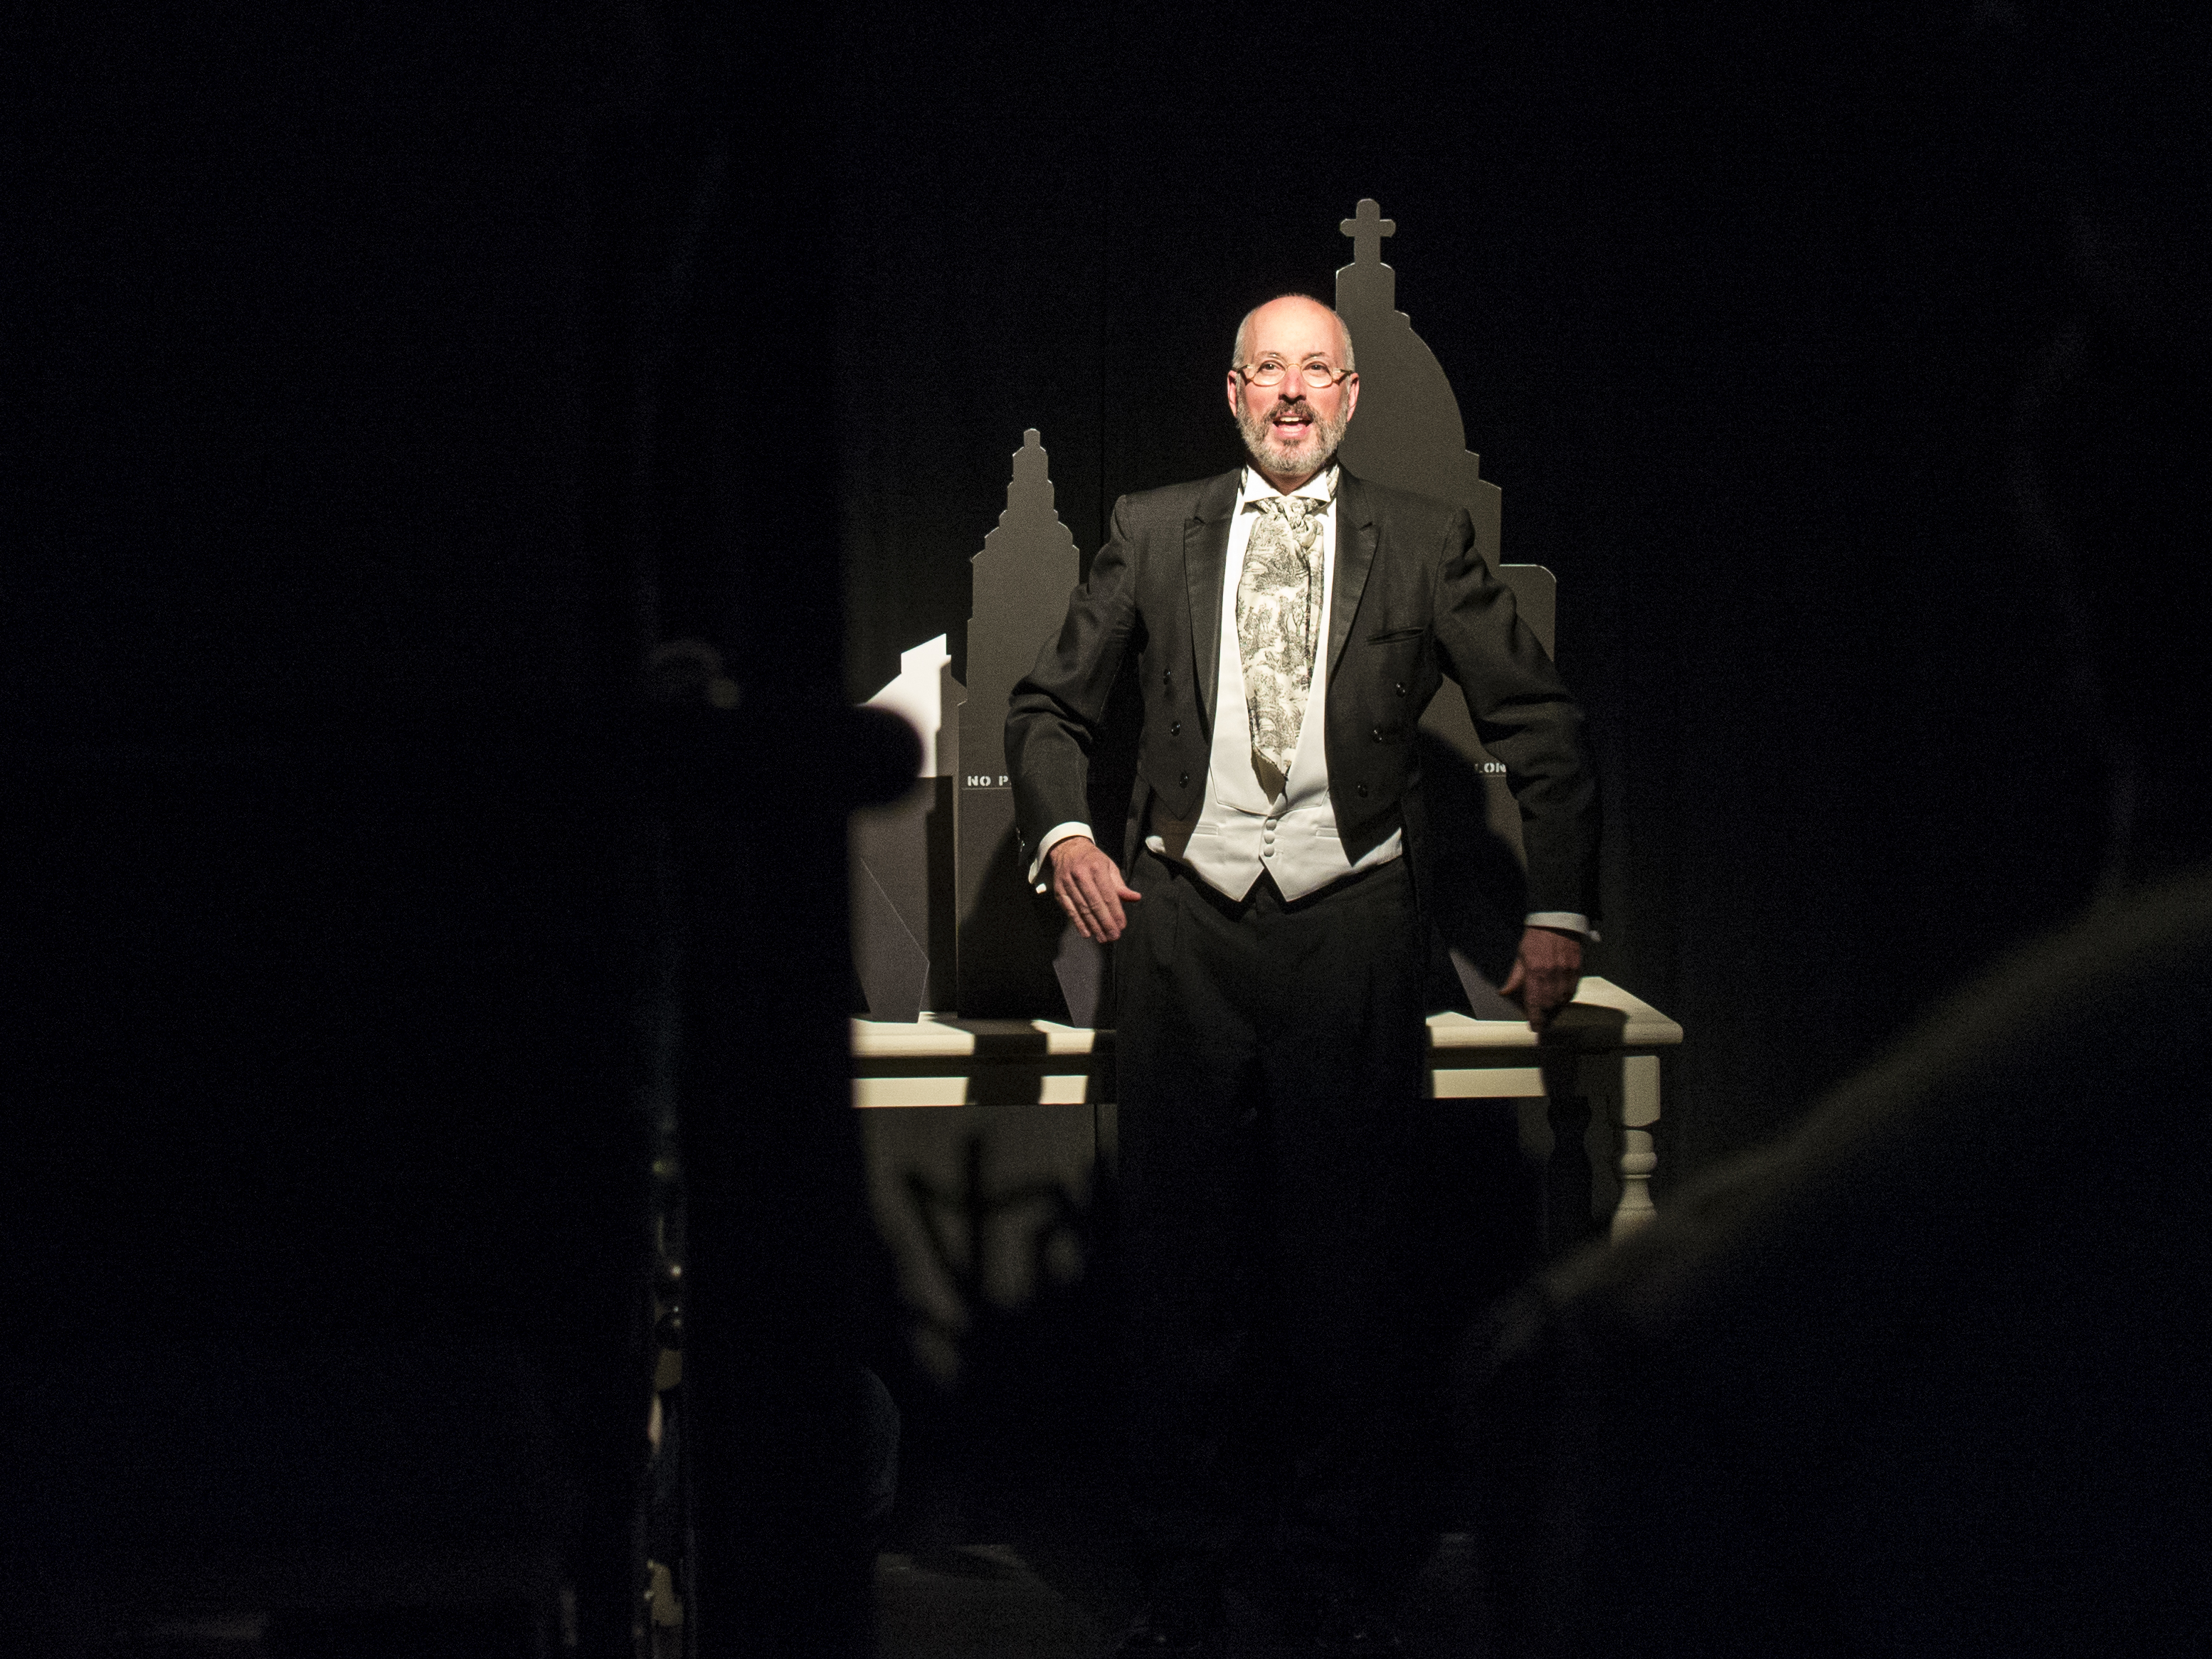 Sweeney Todd - Friday 001.jpg